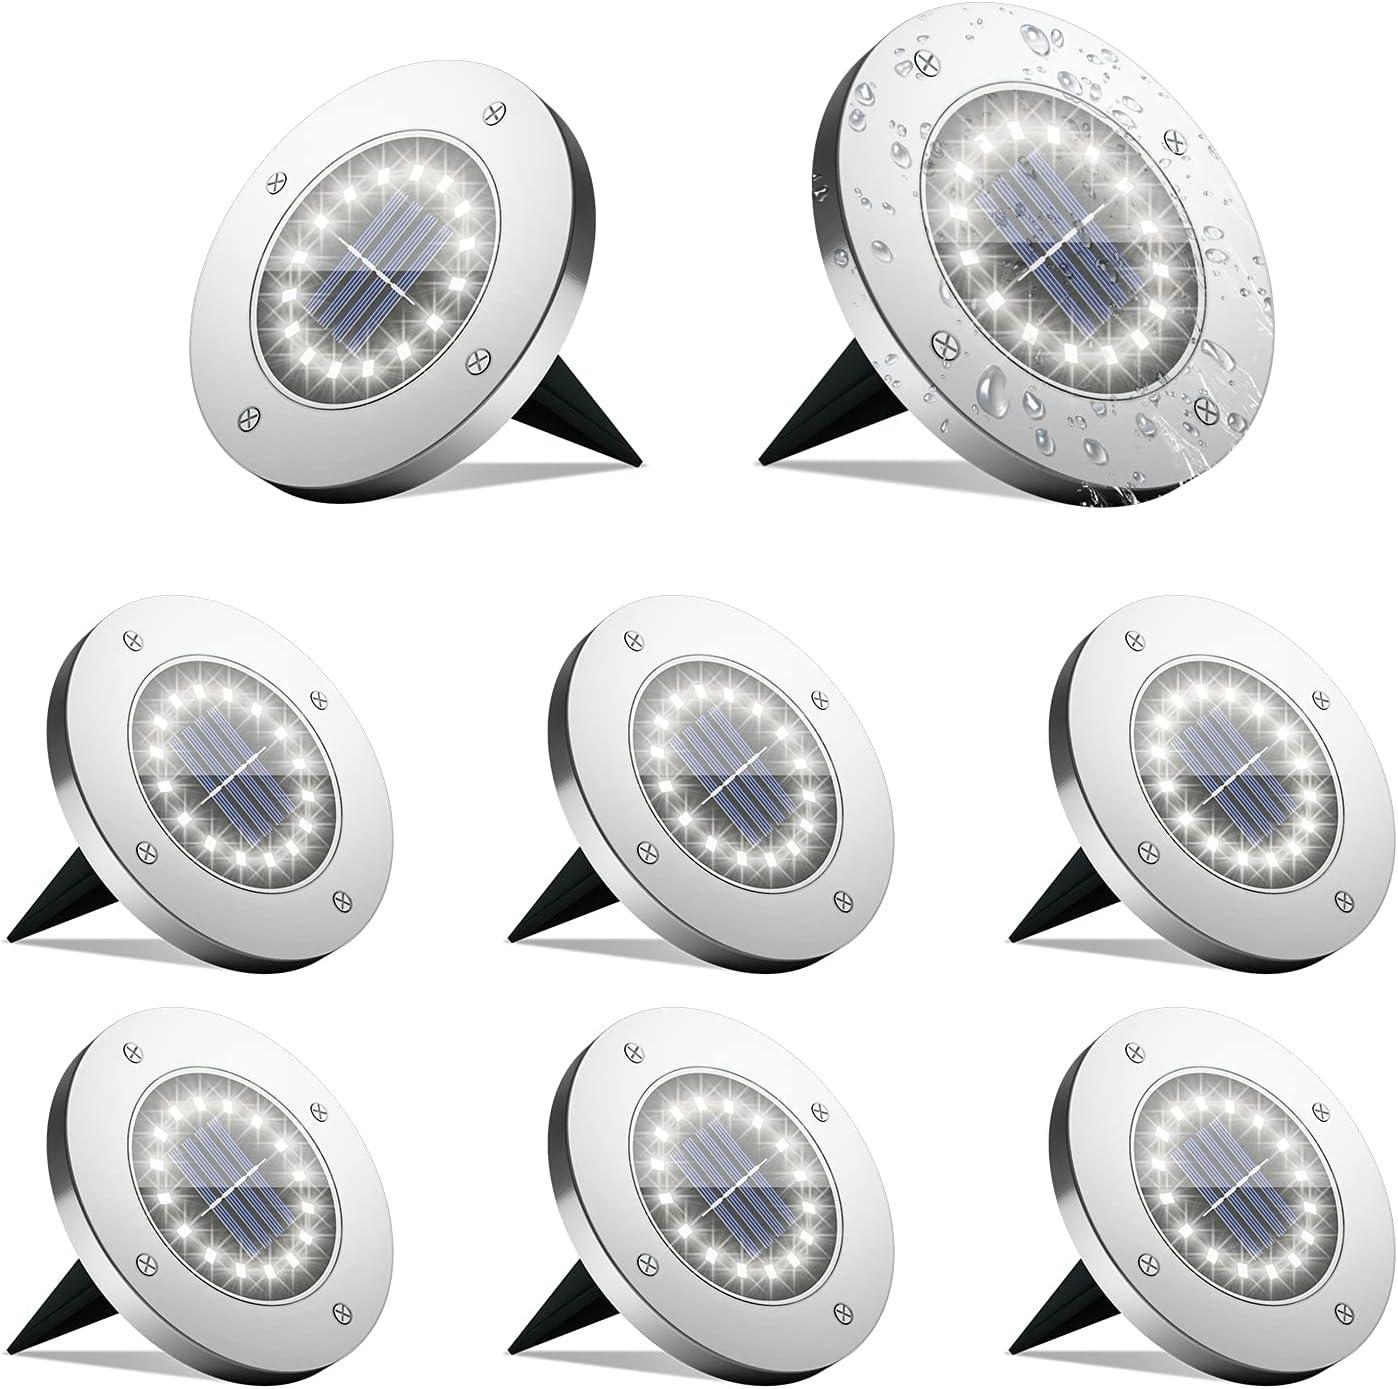 SolarGround Lights,(16 LED)Solar DiskLights, Solar Outdoor Lights Waterproof, Prisame LandscapeLightsforGarden, Pathway, Yard, Patio, Walkway, Grounds(8 Pack)